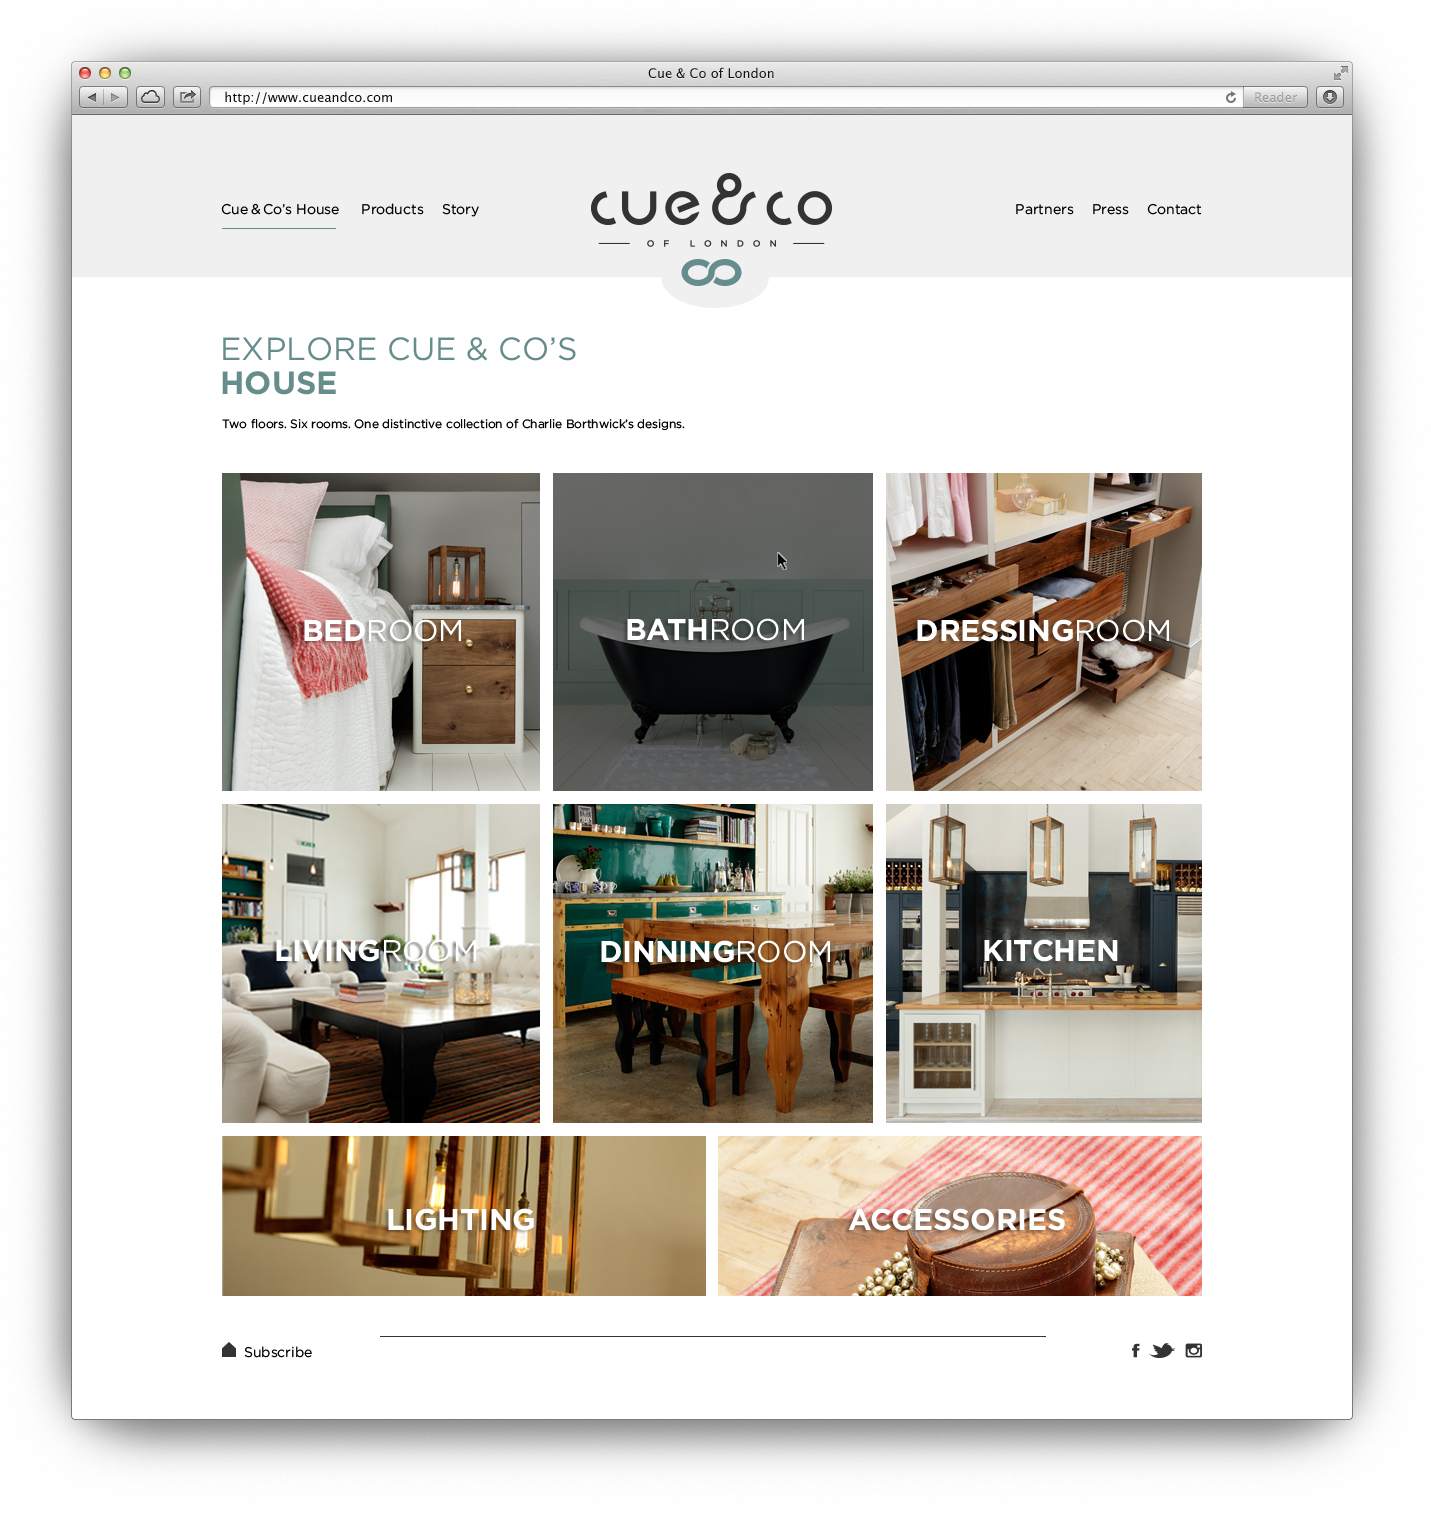 Cue&Co_Desktop_TheHouse_v3.2.jpg